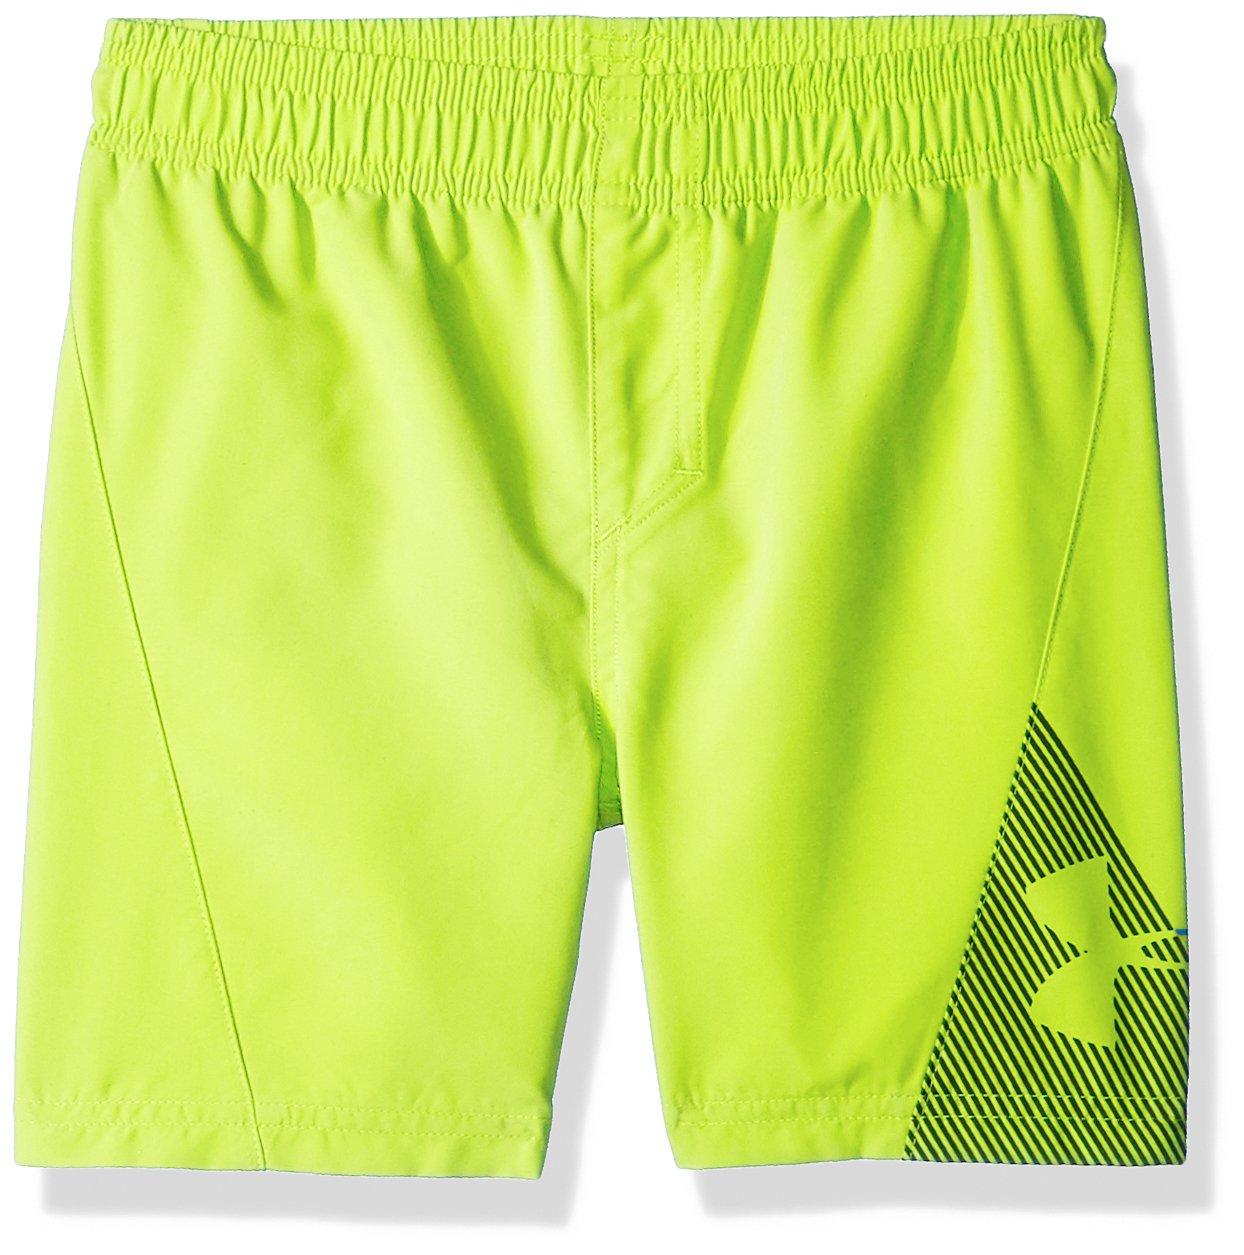 Under Armour Slash Volley Little Boys' Swim Shorts, Hi Gh/Vis Yellow, 5